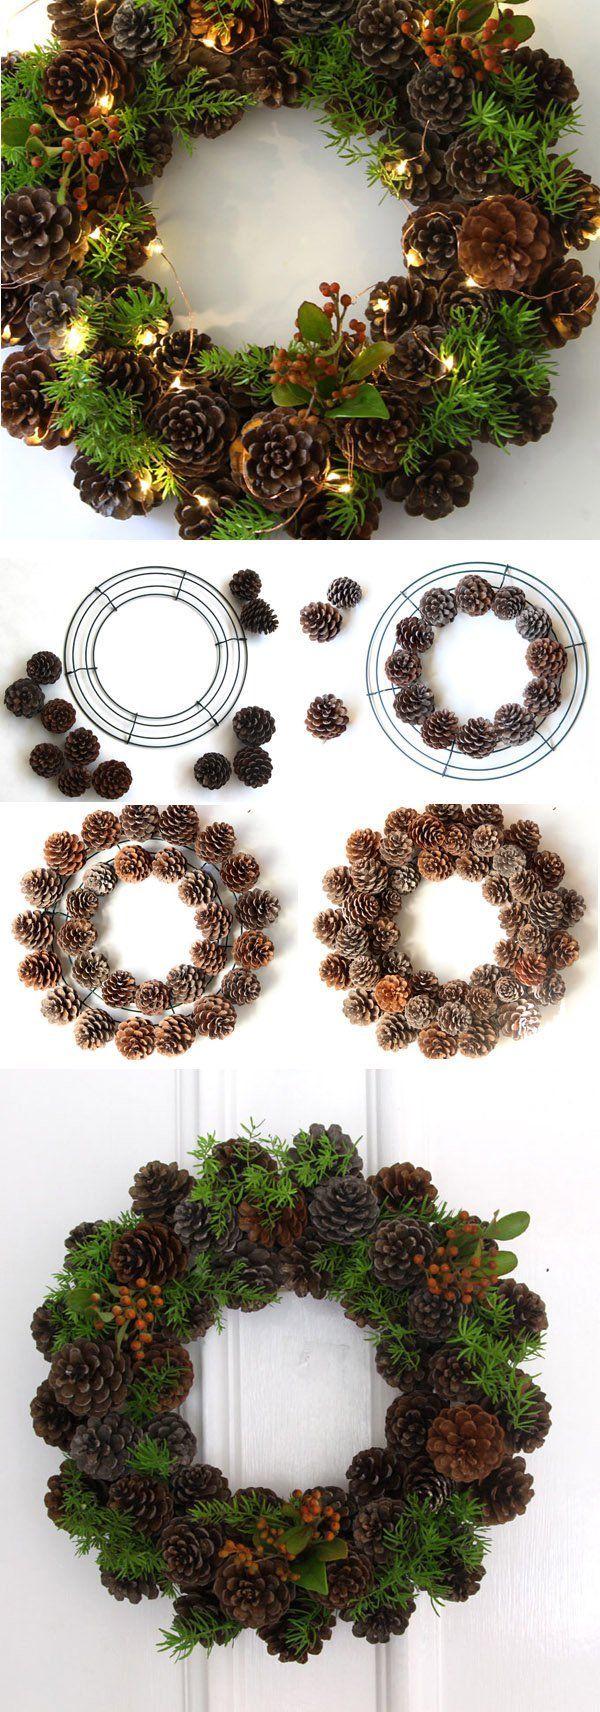 30 Wonderful DIY Christmas Wreaths 162 best